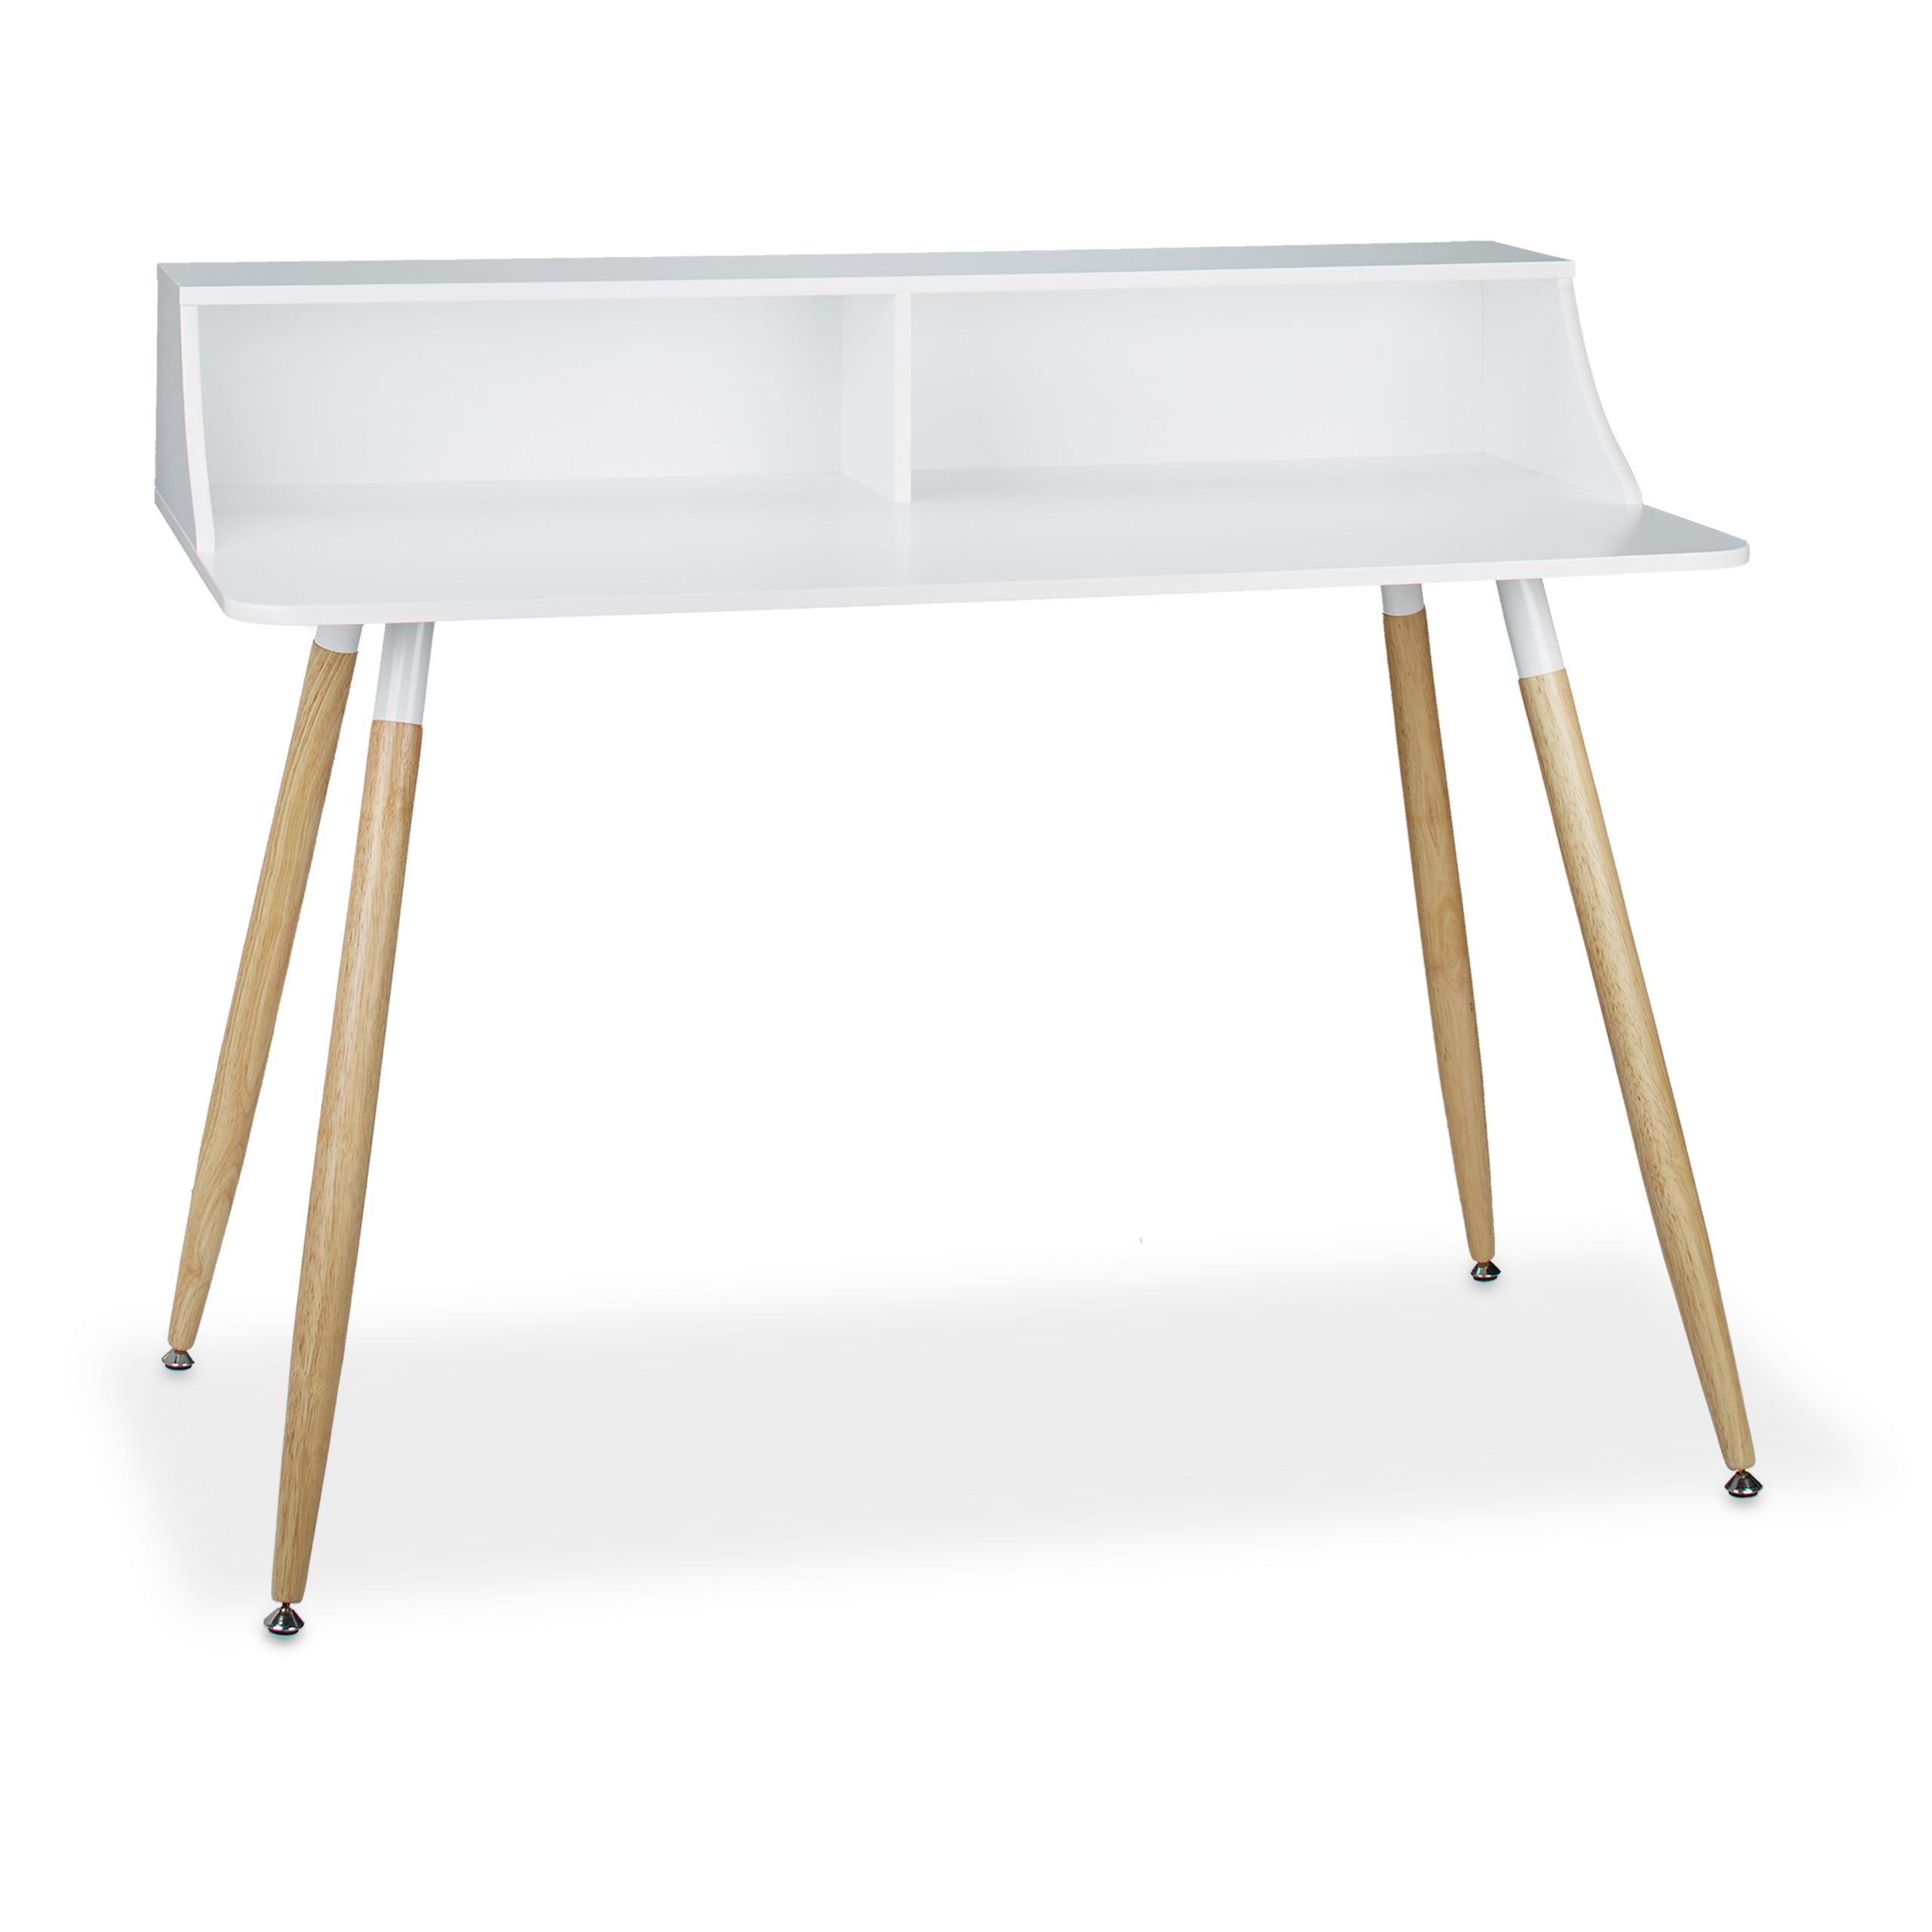 bureau-kinderbureau-ruimtebesparend-75-cm-hoog-laptoptafel-120-breed miniatuur 6